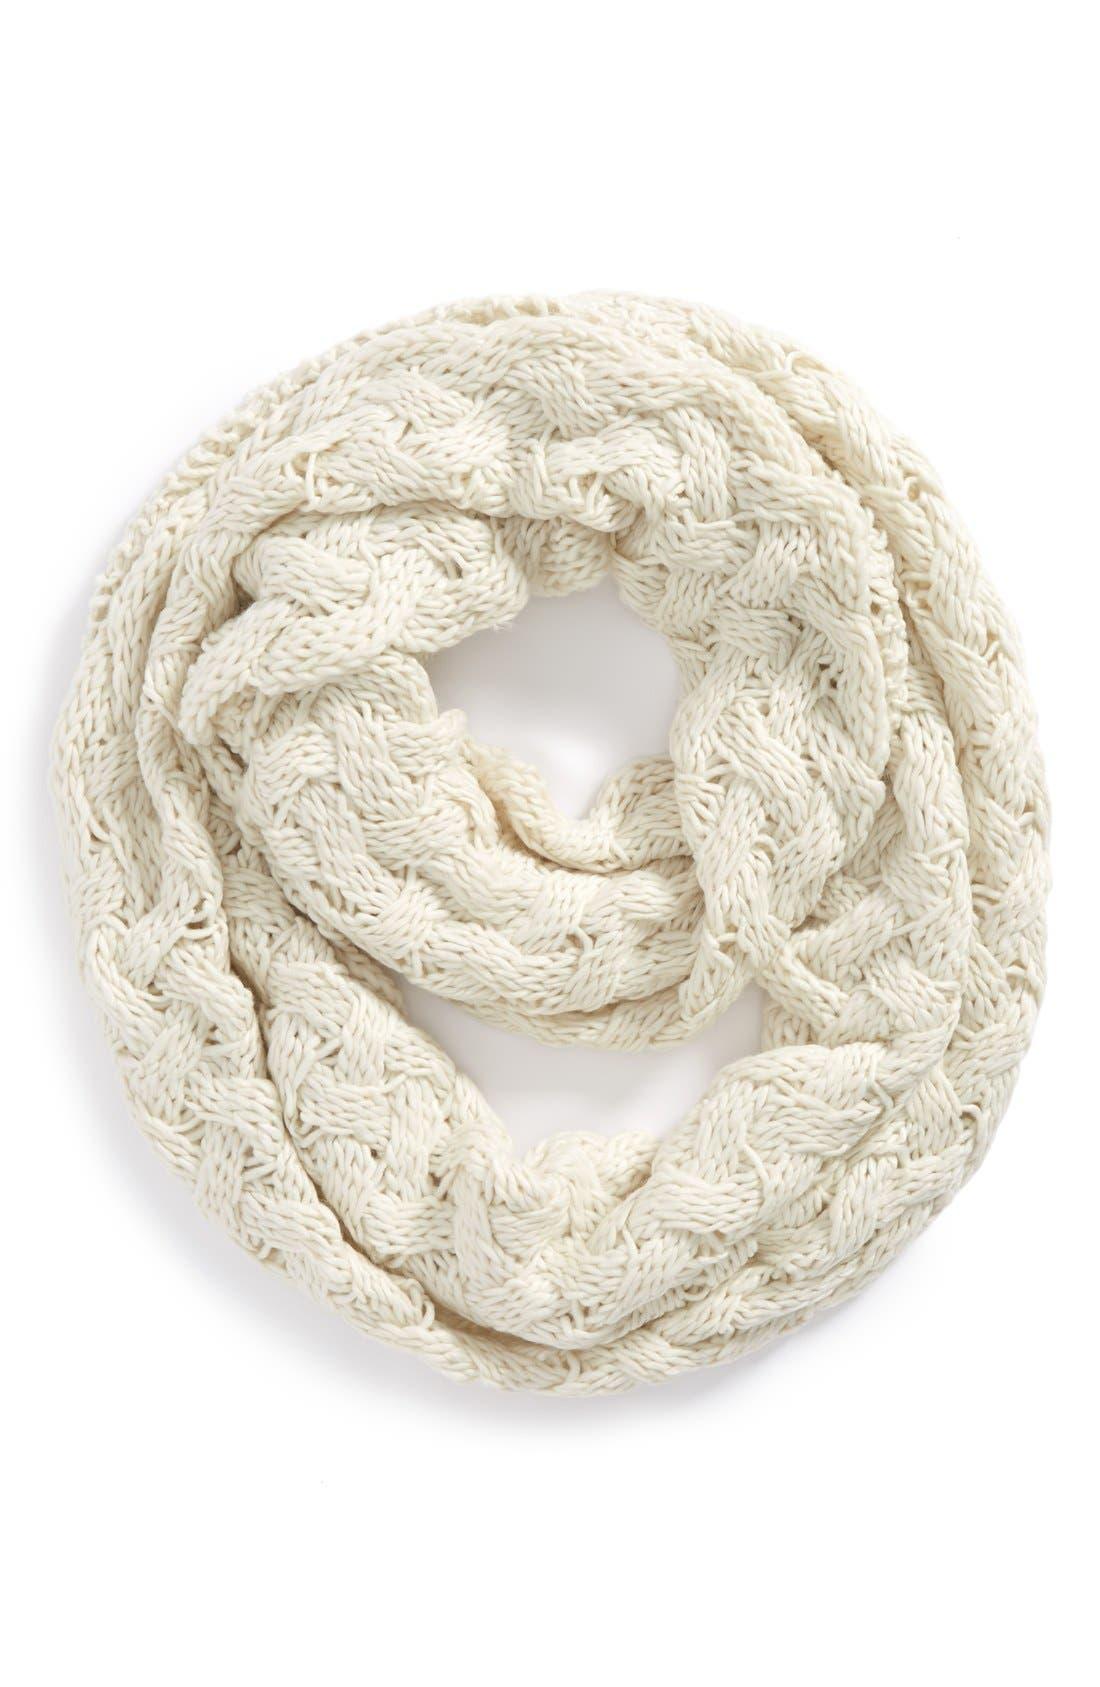 Main Image - Tildon Crisscross Knit Infinity Scarf